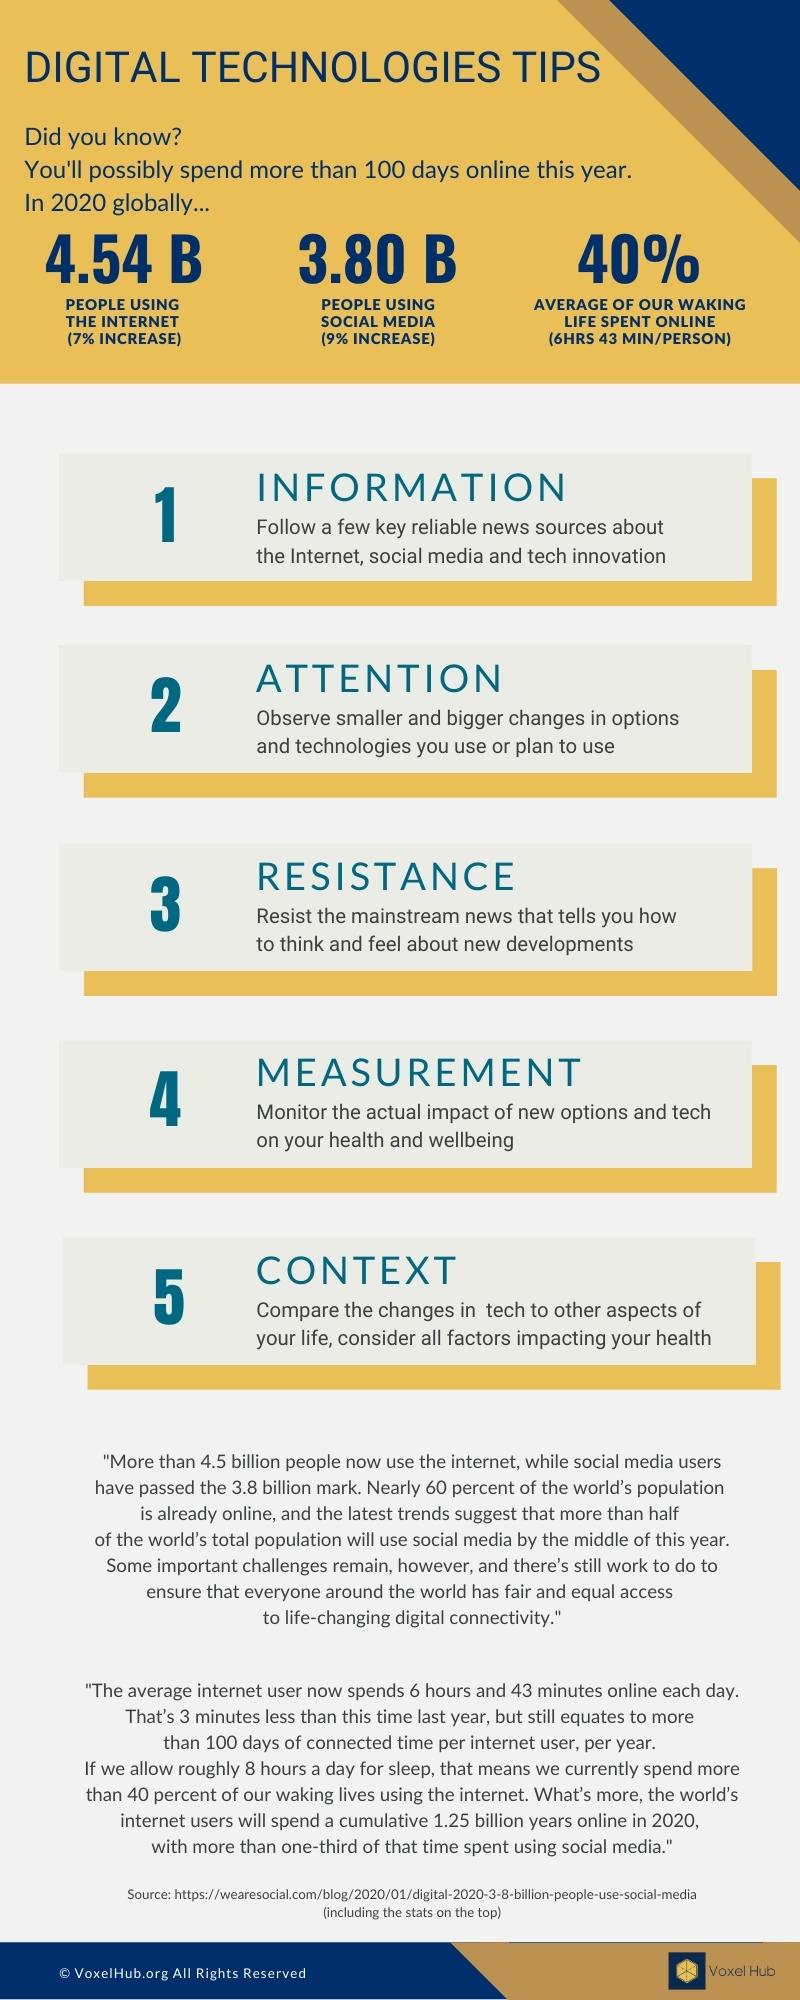 Digital Technology Tips